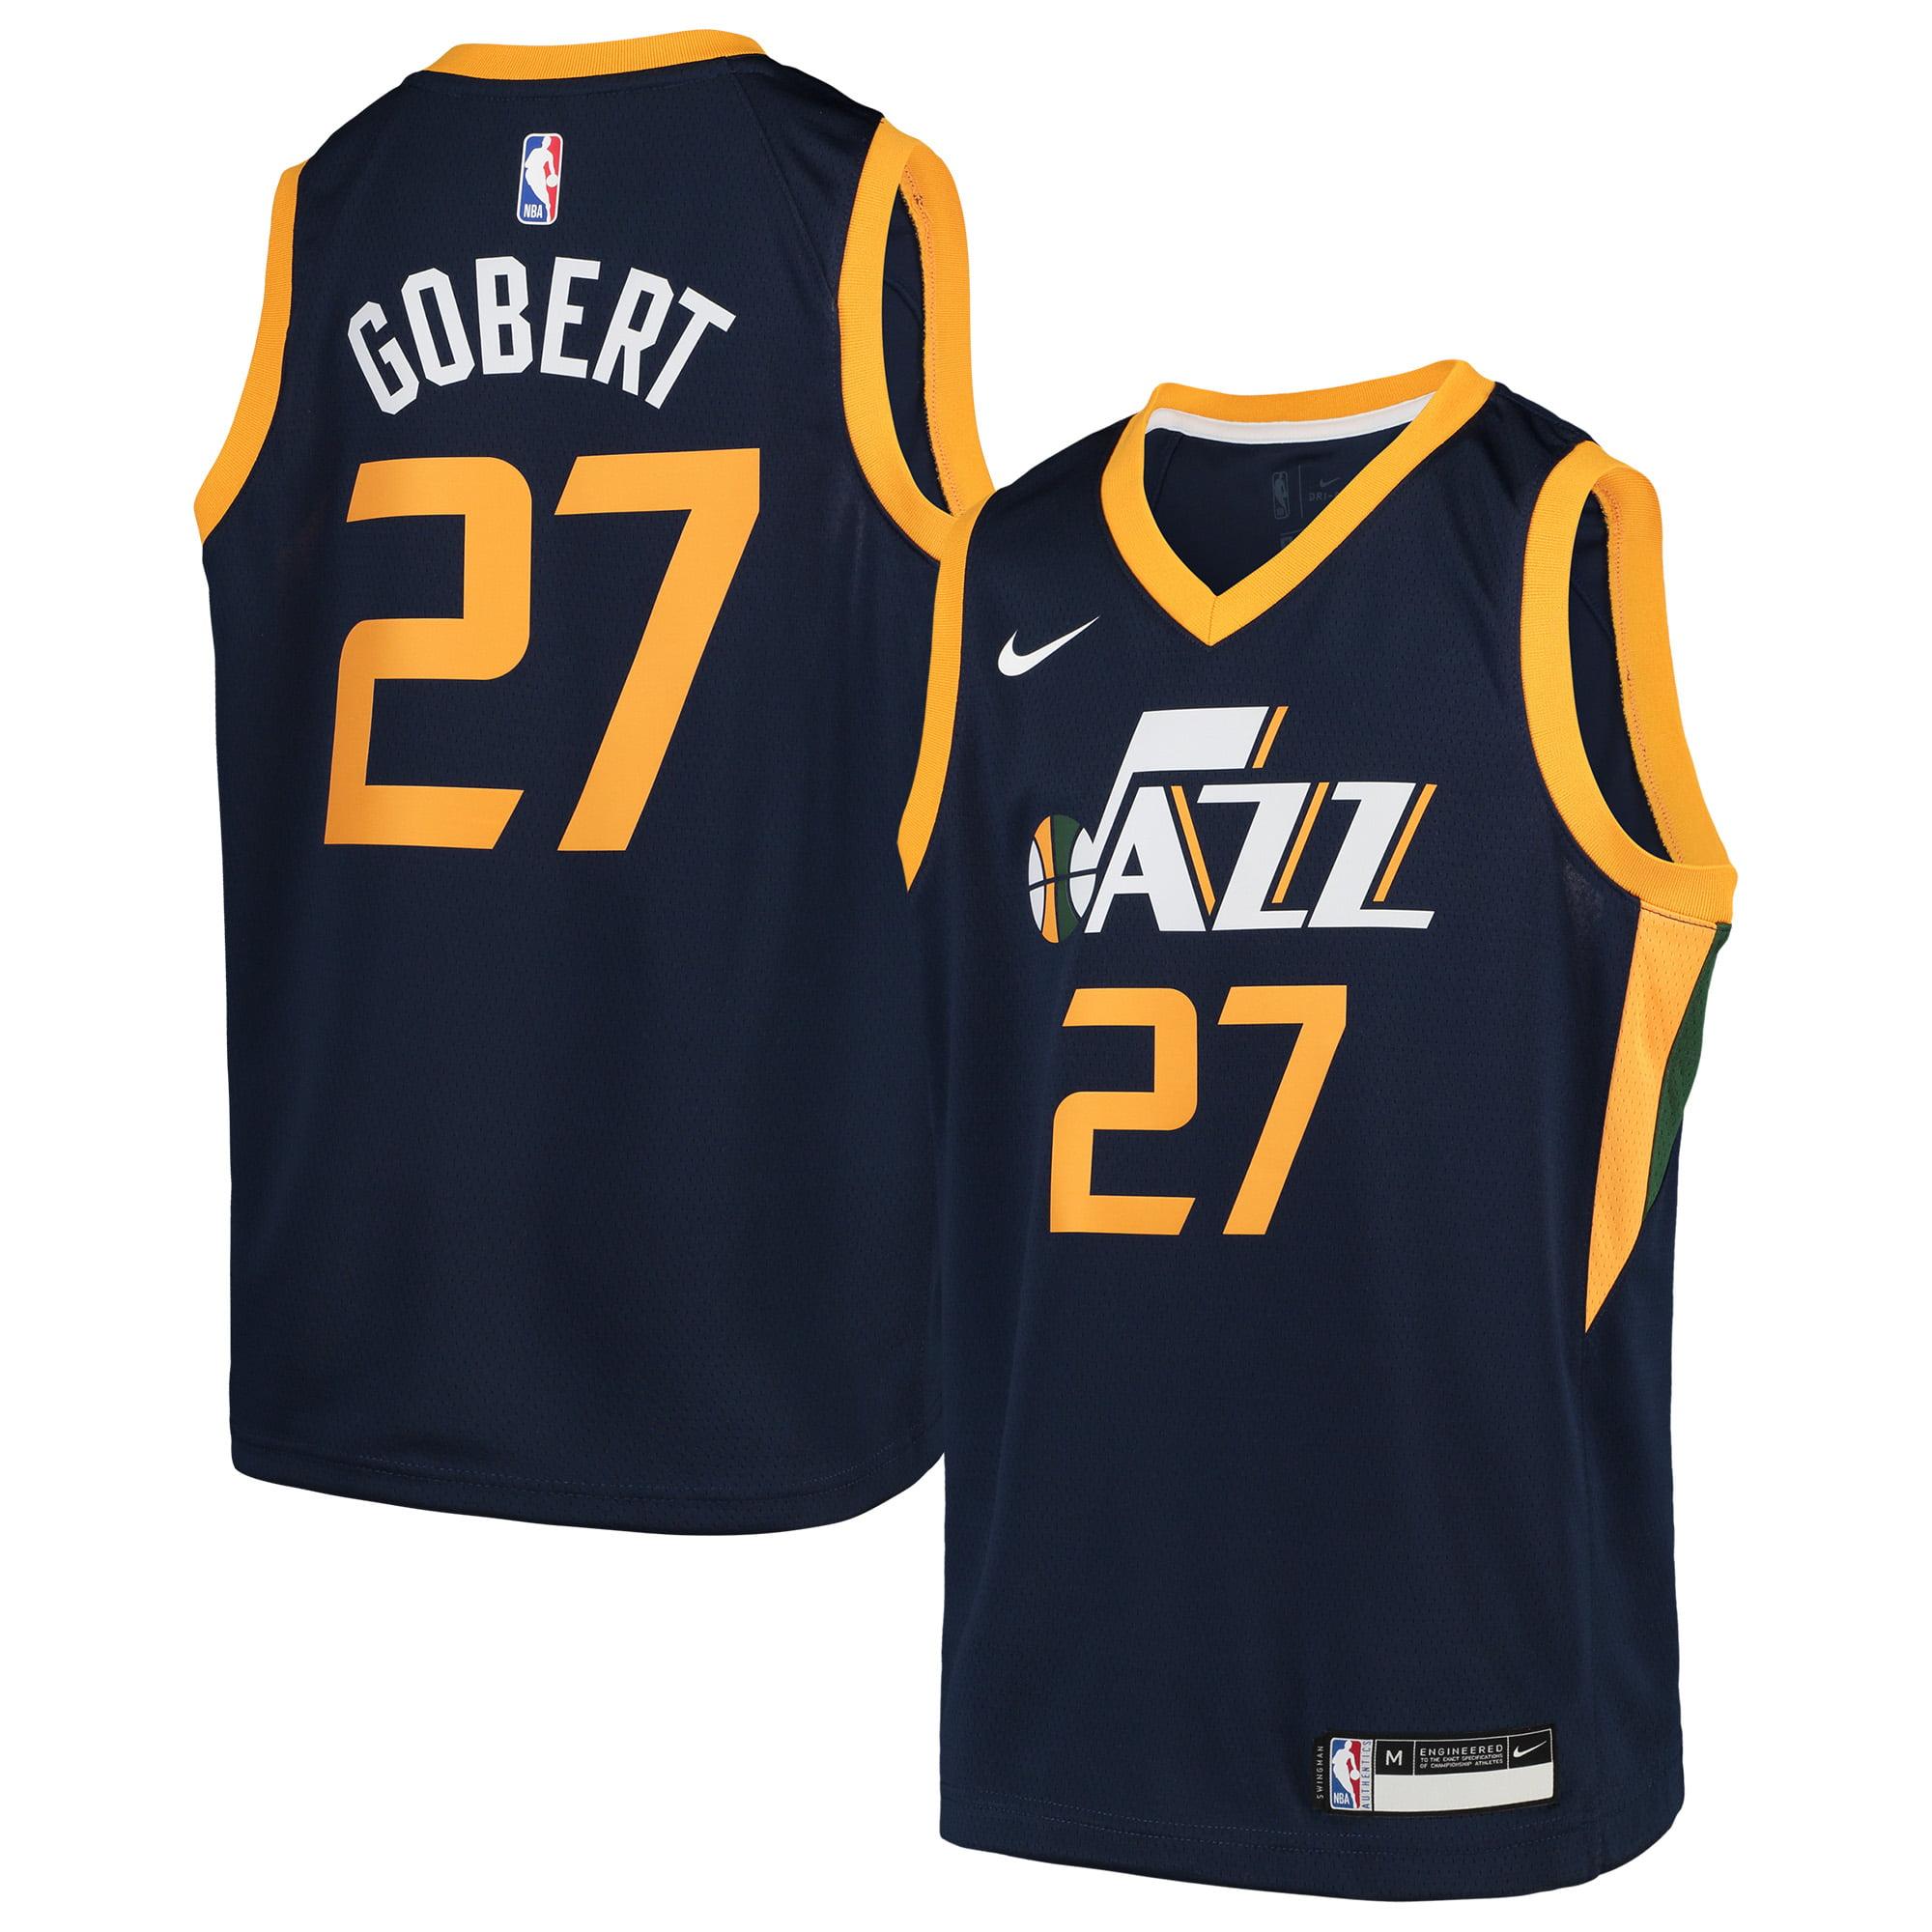 438ba58e4 Rudy Gobert Utah Jazz Nike Youth Swingman Jersey - Navy - Icon Edition -  Walmart.com